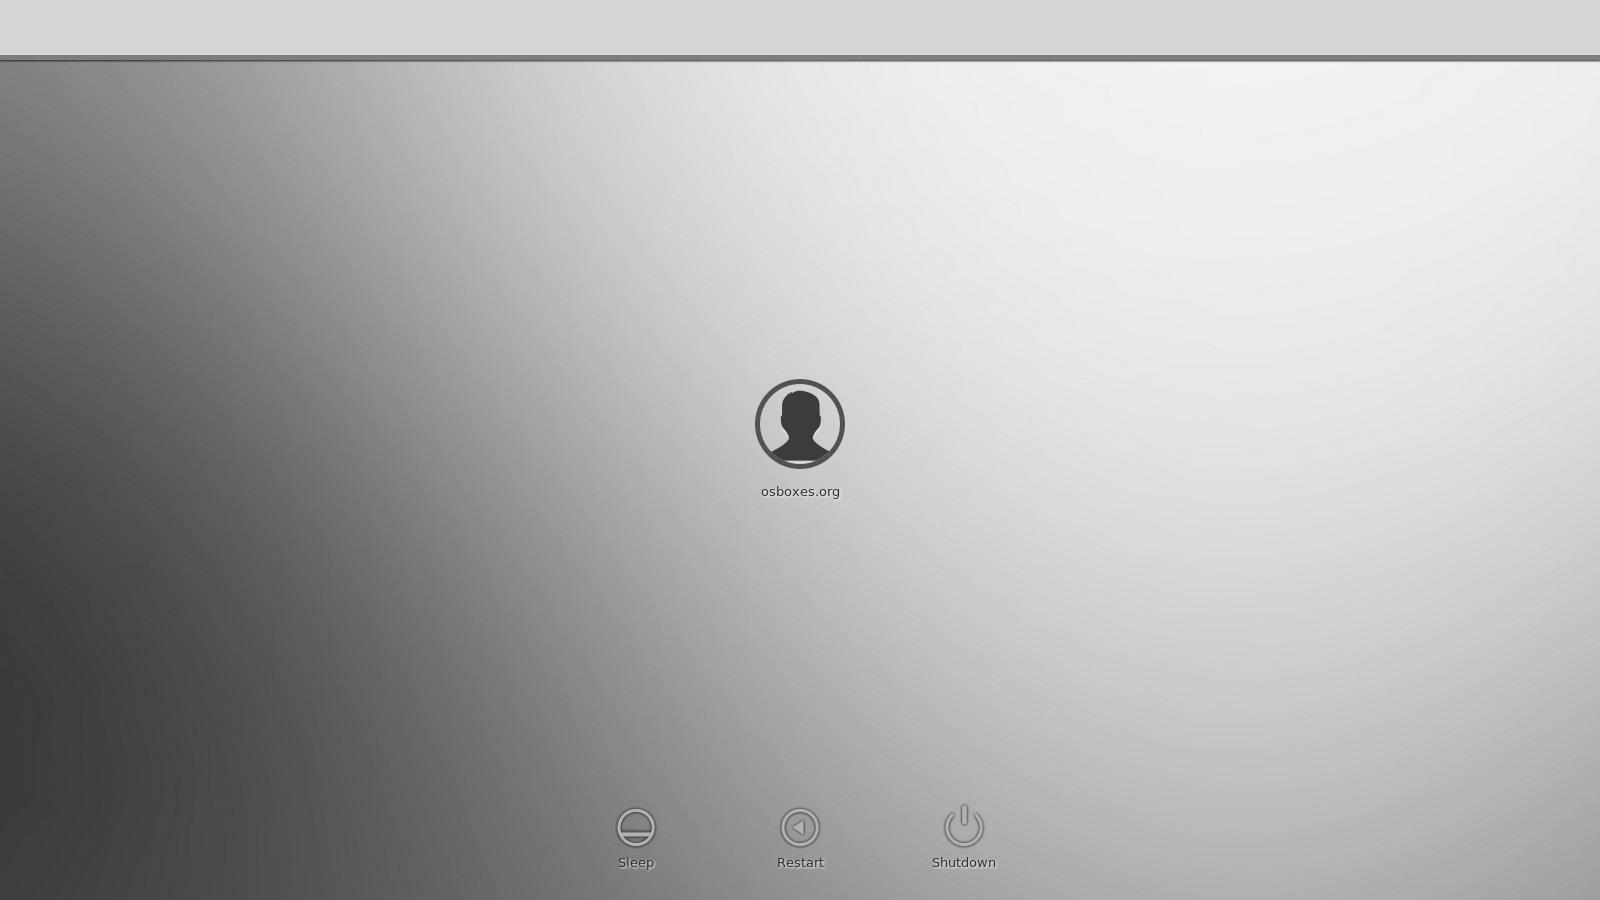 Download Ubuntu Wallpapers Hd Linux Lite 2 2 Images Released For Virtualbox Amp Vmware